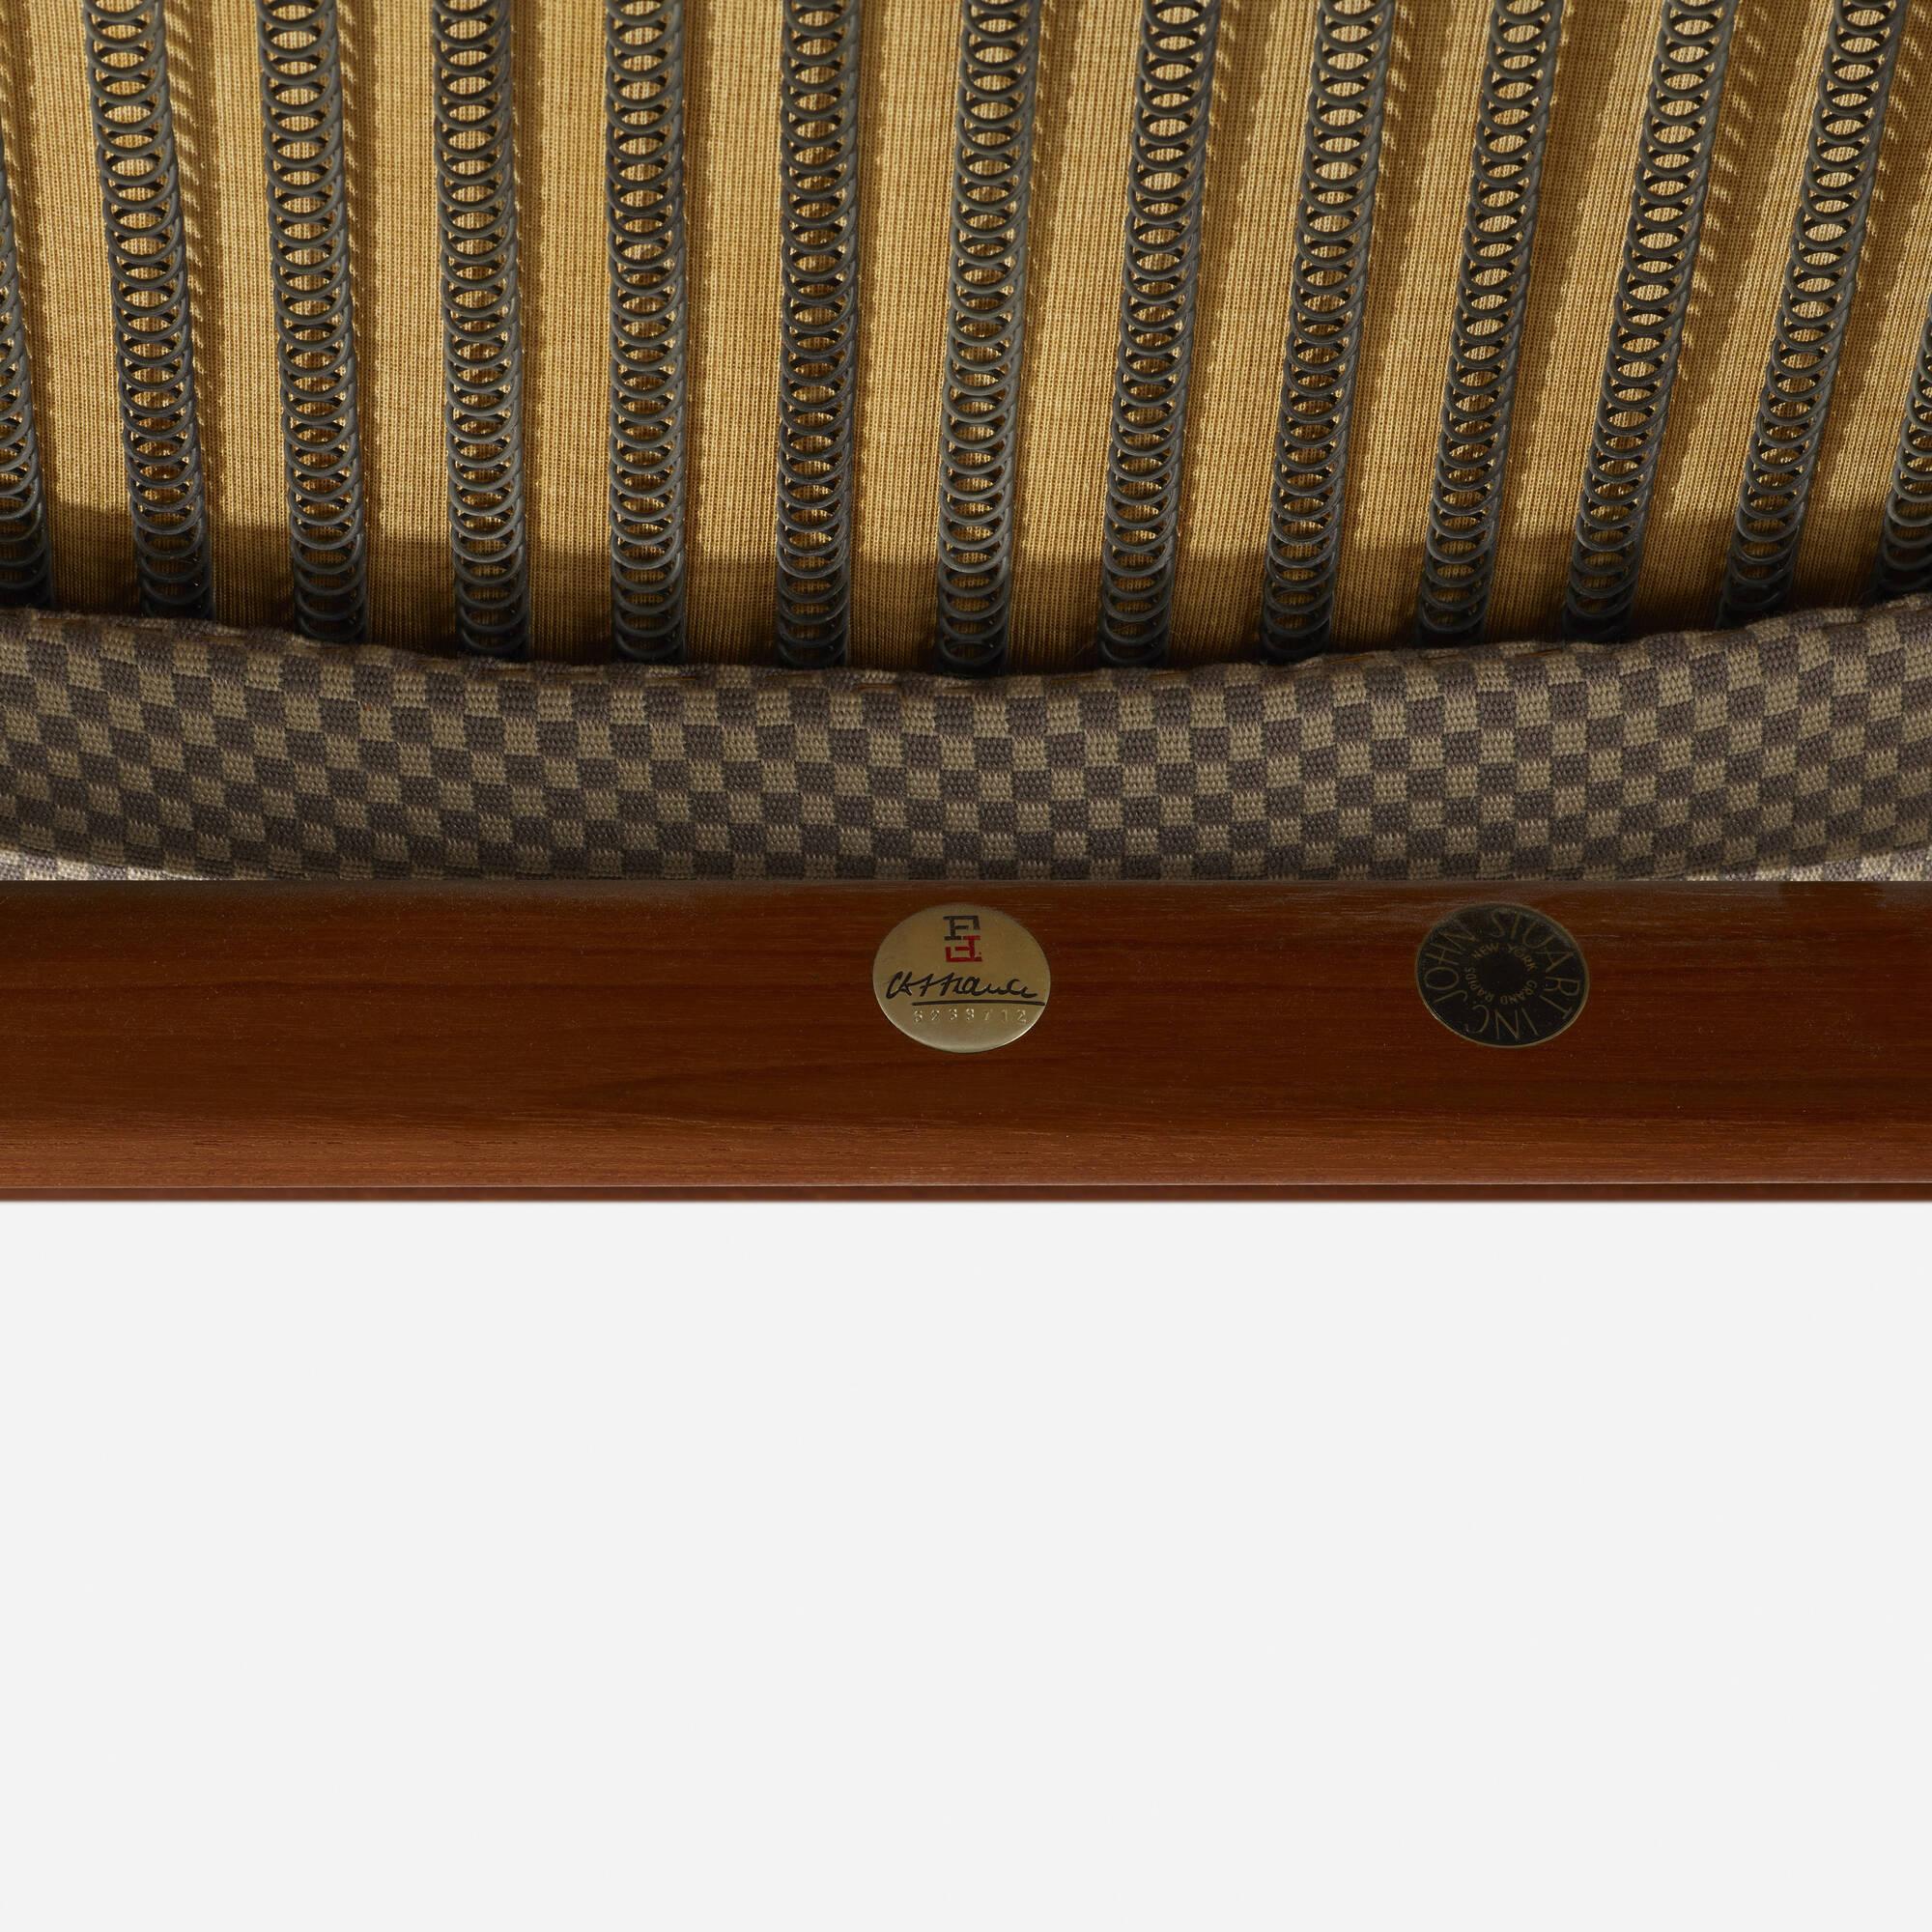 349: Finn Juhl / Bwana armchair (4 of 4)